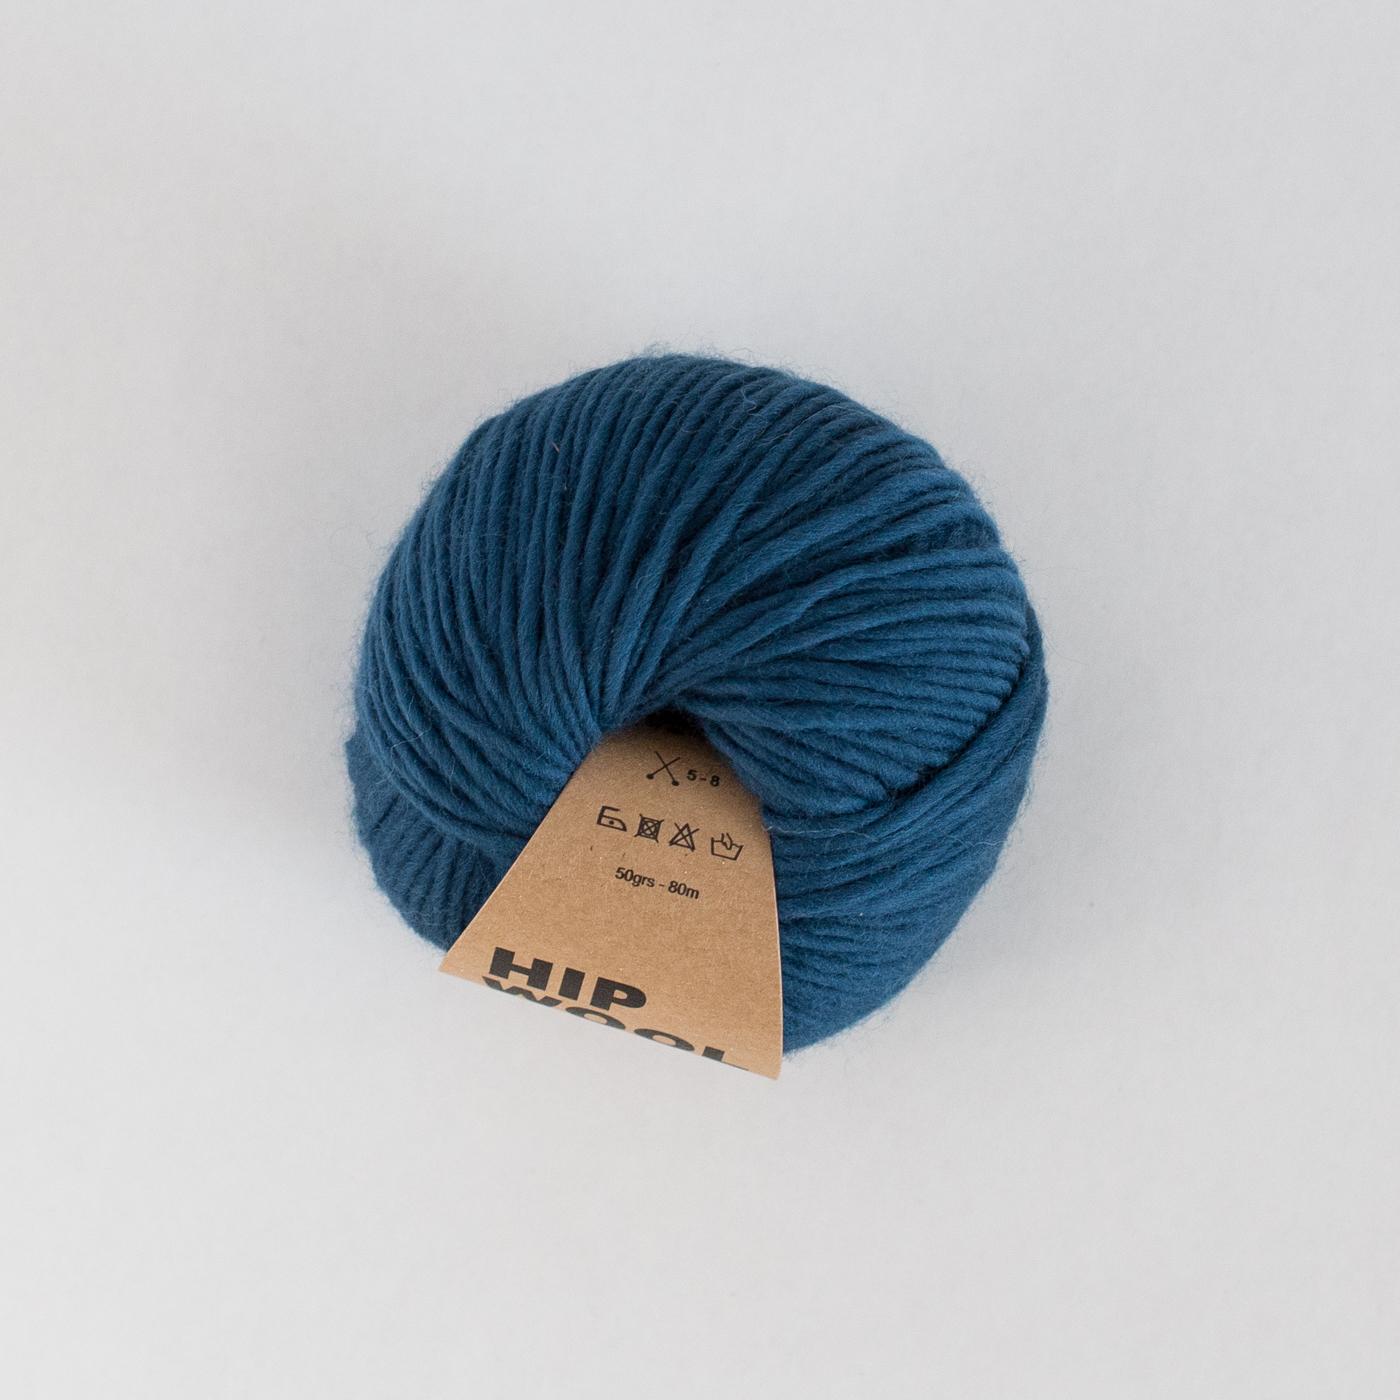 blue yarn online shop